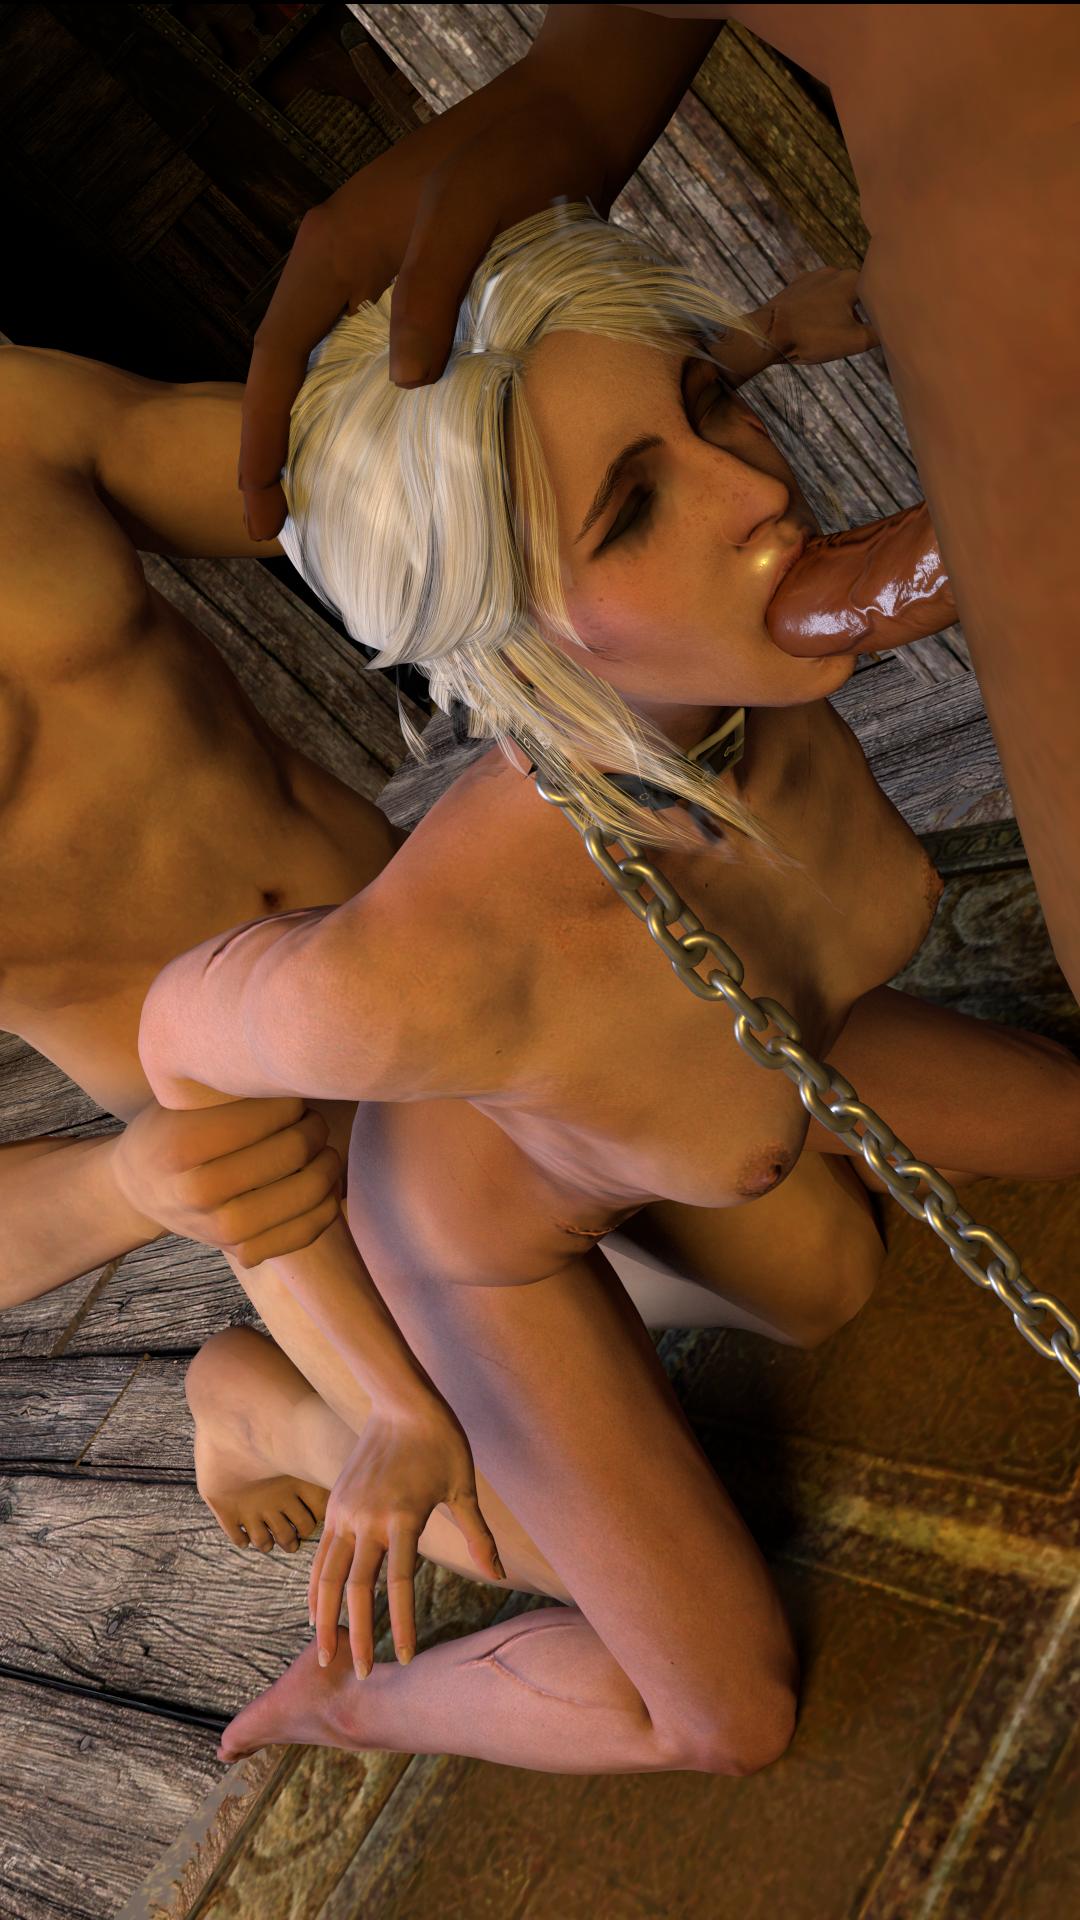 Ciri porn witcher the The dark